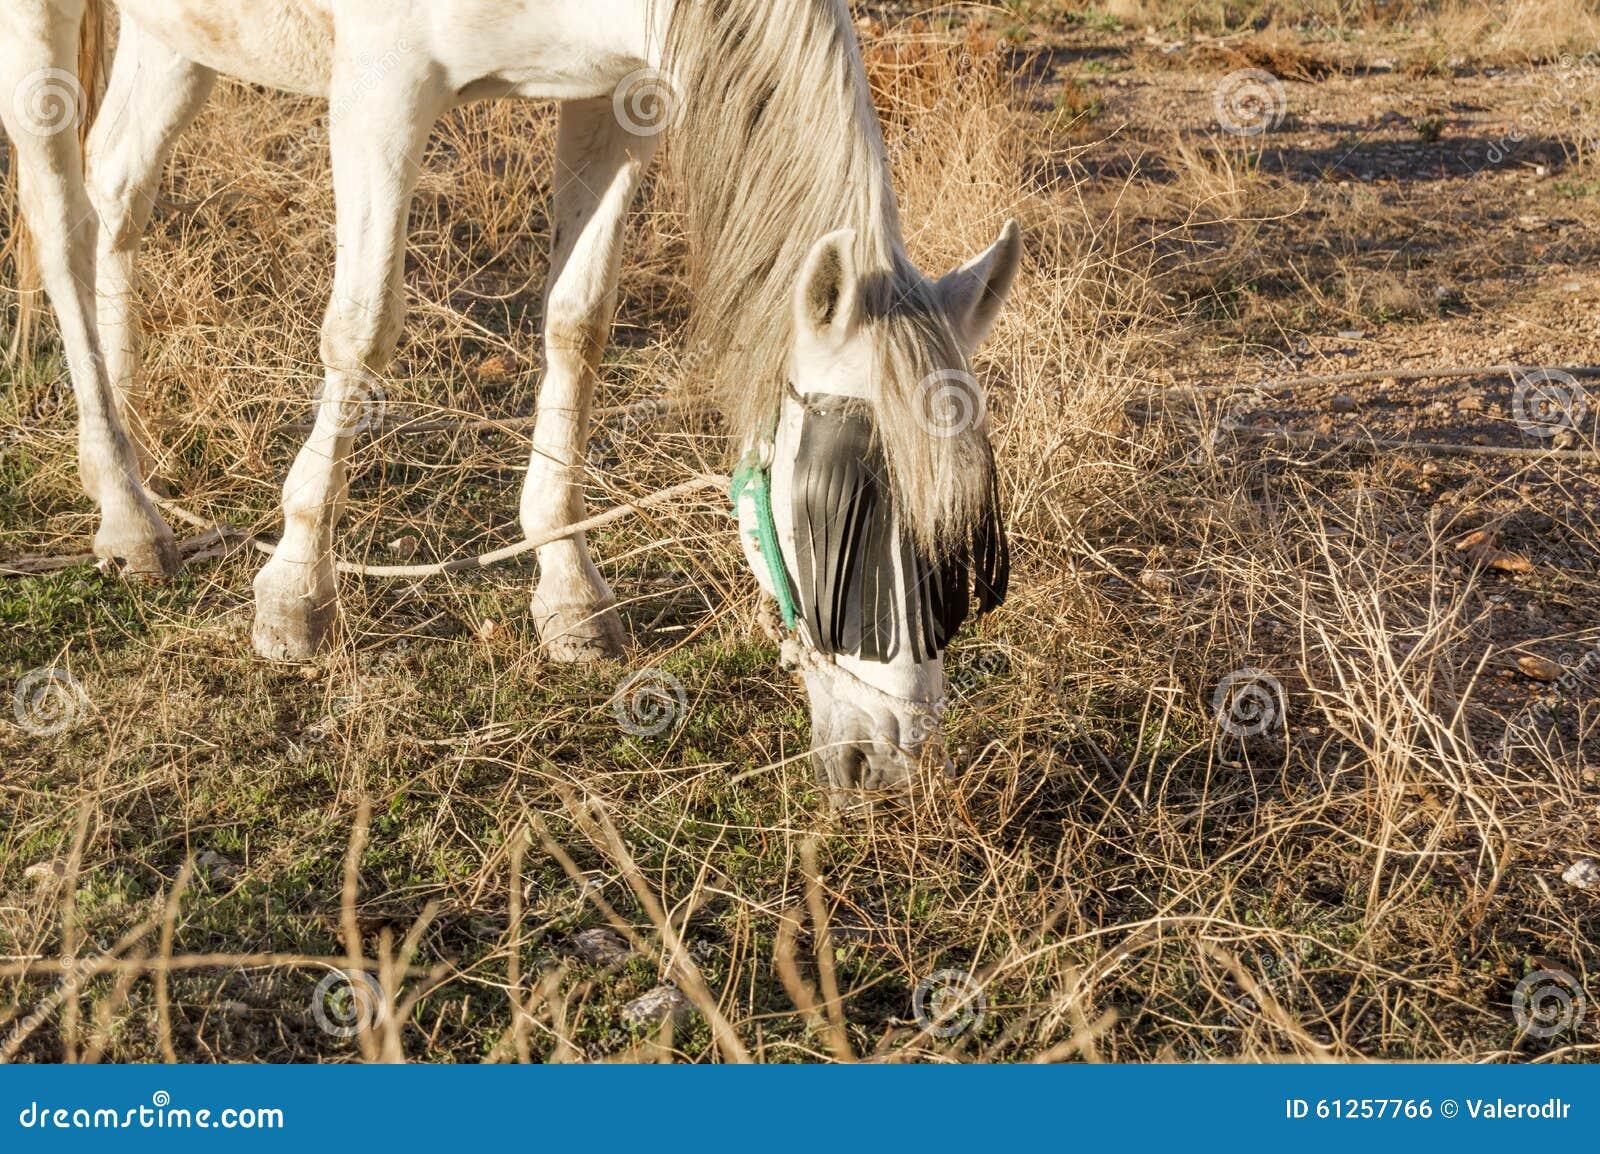 White horse eating grass - photo#20